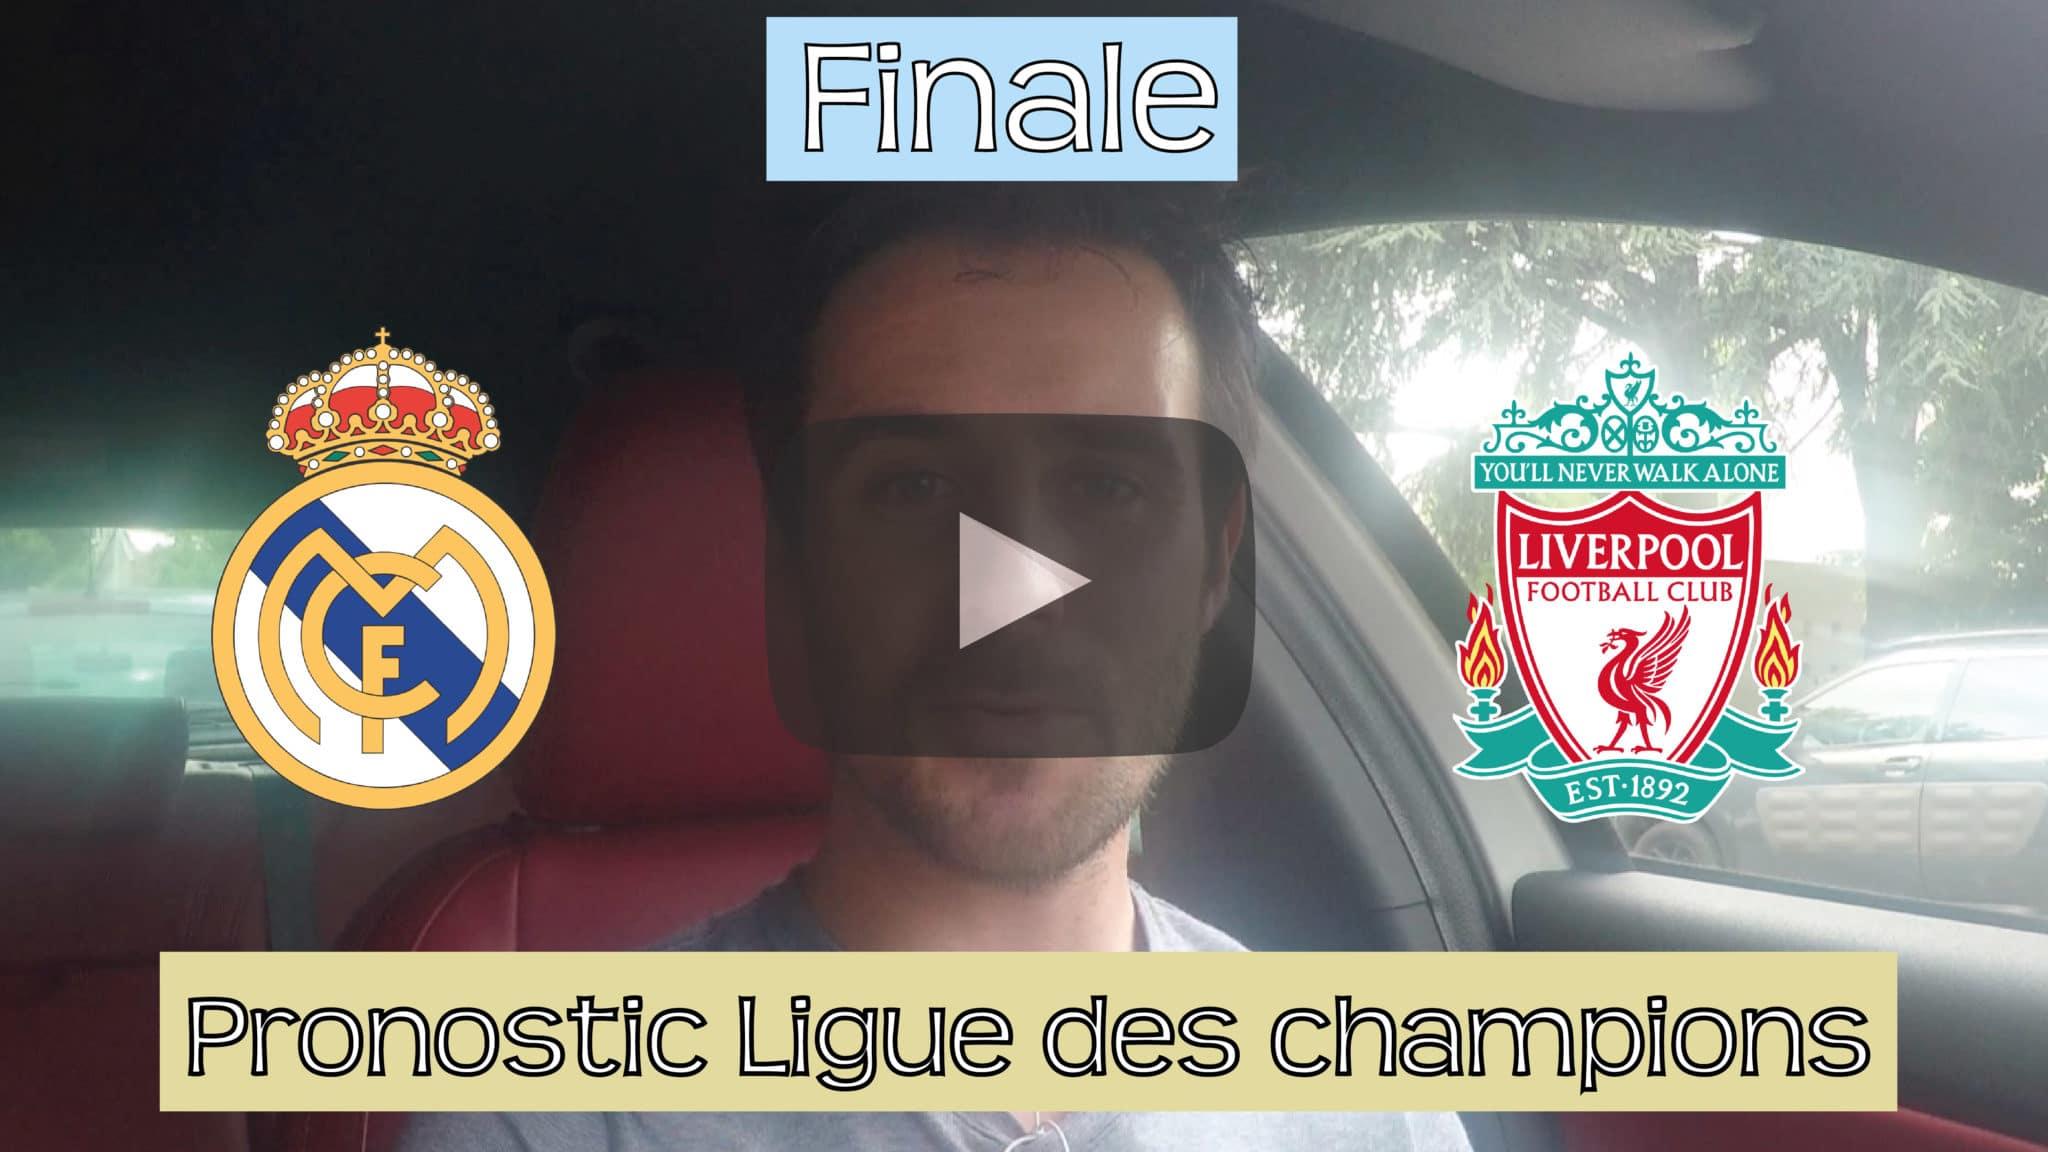 [Public] Pronostic 11 – Real Madrid / Liverpool – Ligue des champions